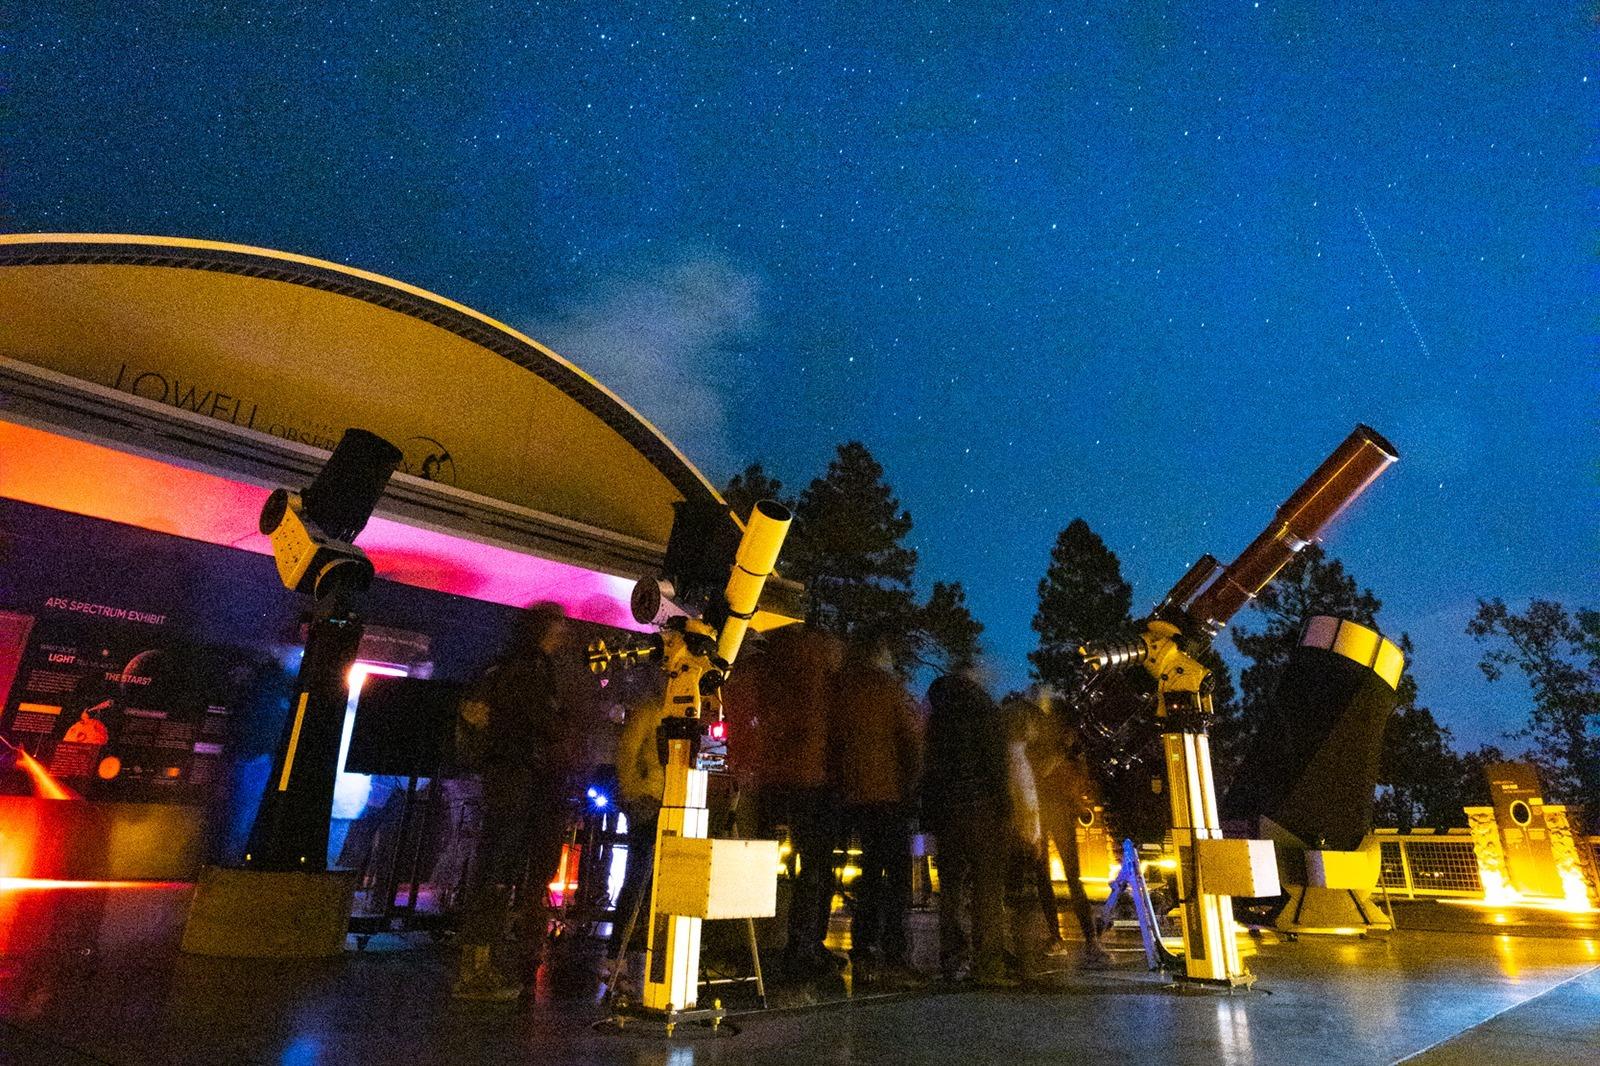 The Lowell Observatory in Flagstaff, AZ